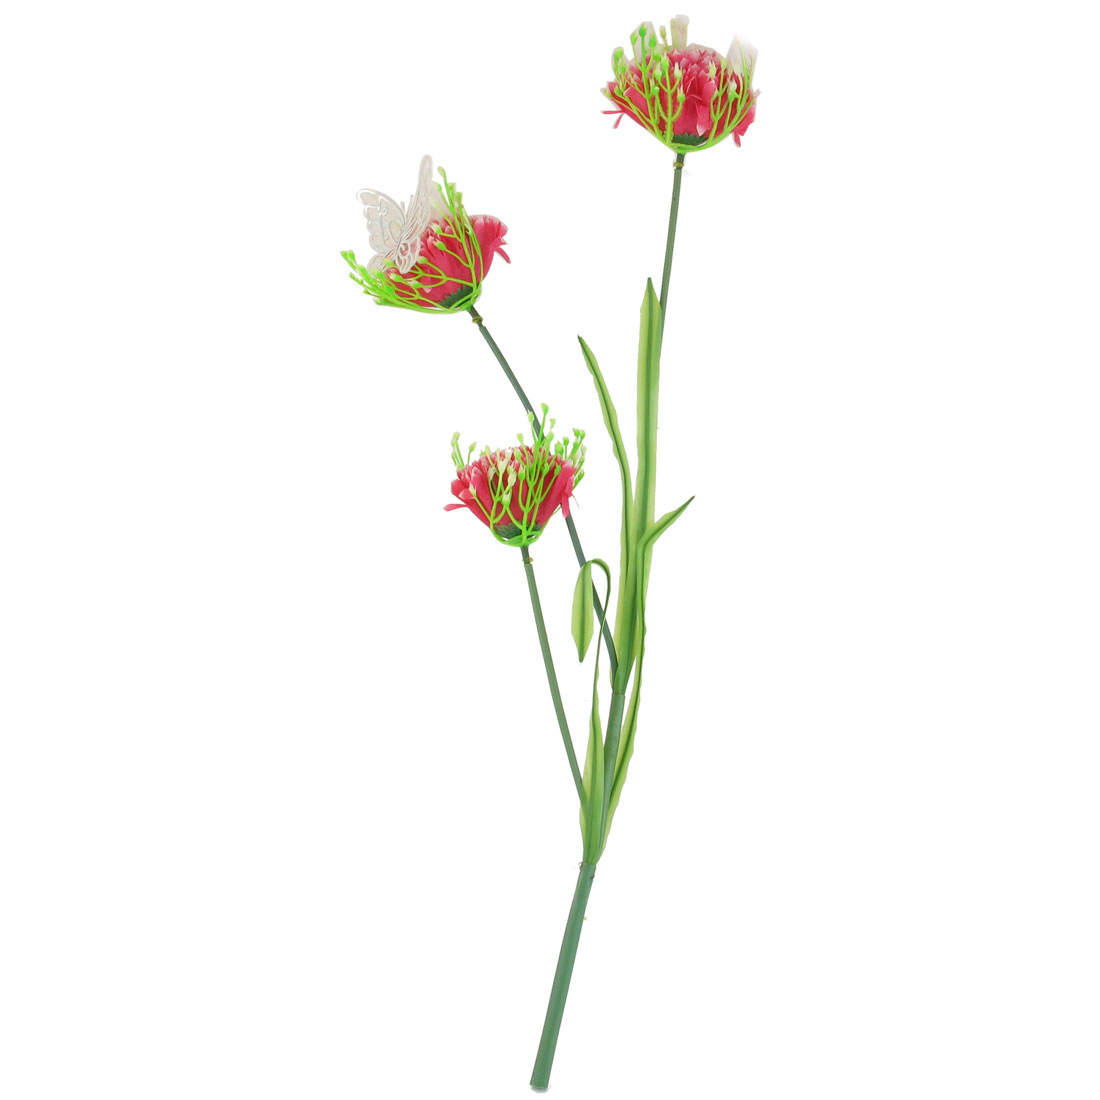 Wedding Party Artificial Bowknot Decor Fabric Fuchsia Flower Bouquet 50cm High